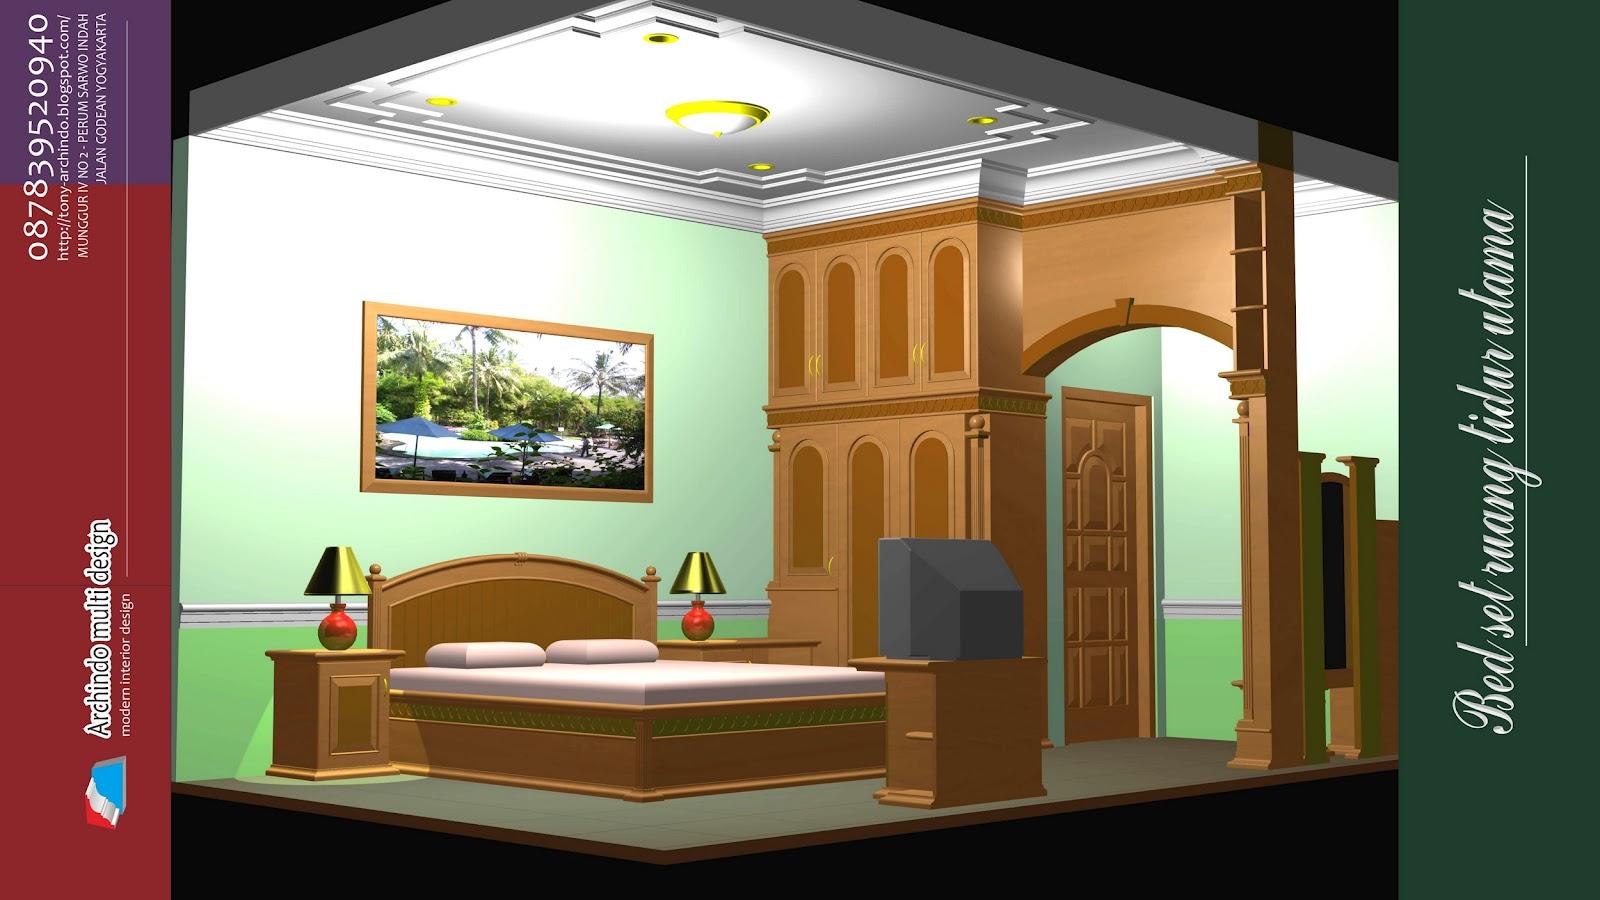 jasa desain interior rumah apartemen kantor stand pameran